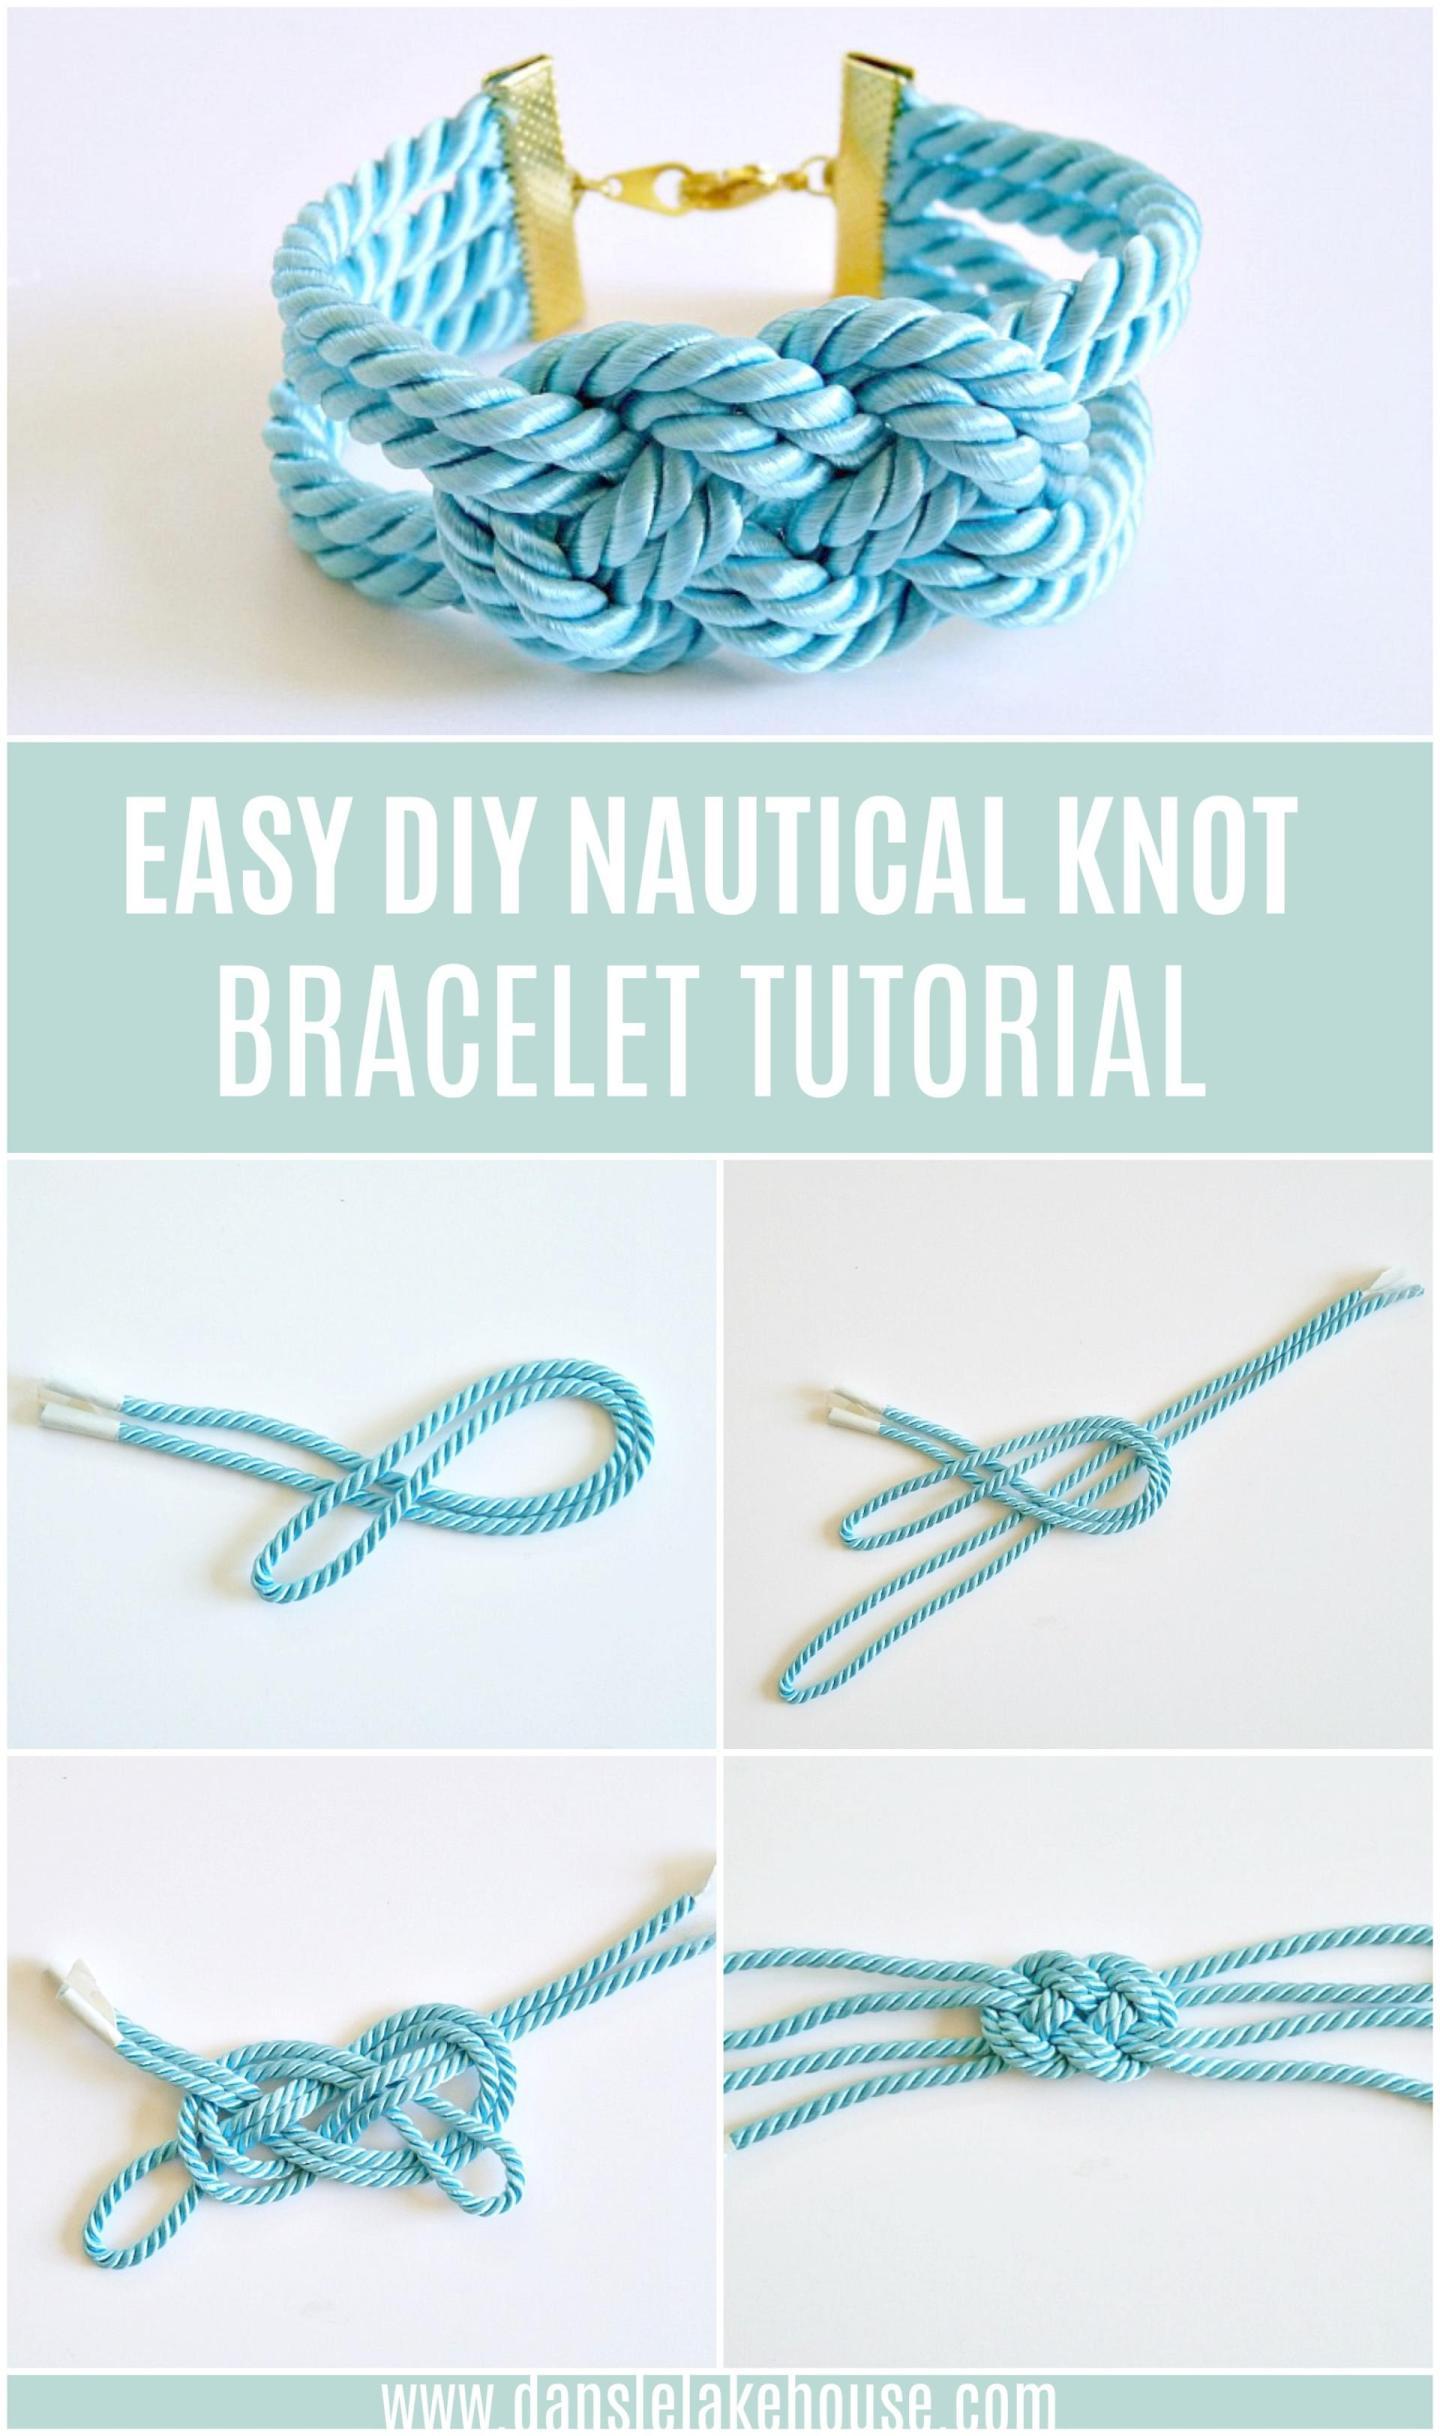 How to Make an Easy DIY Nautical Knot Bracelet Tutorial